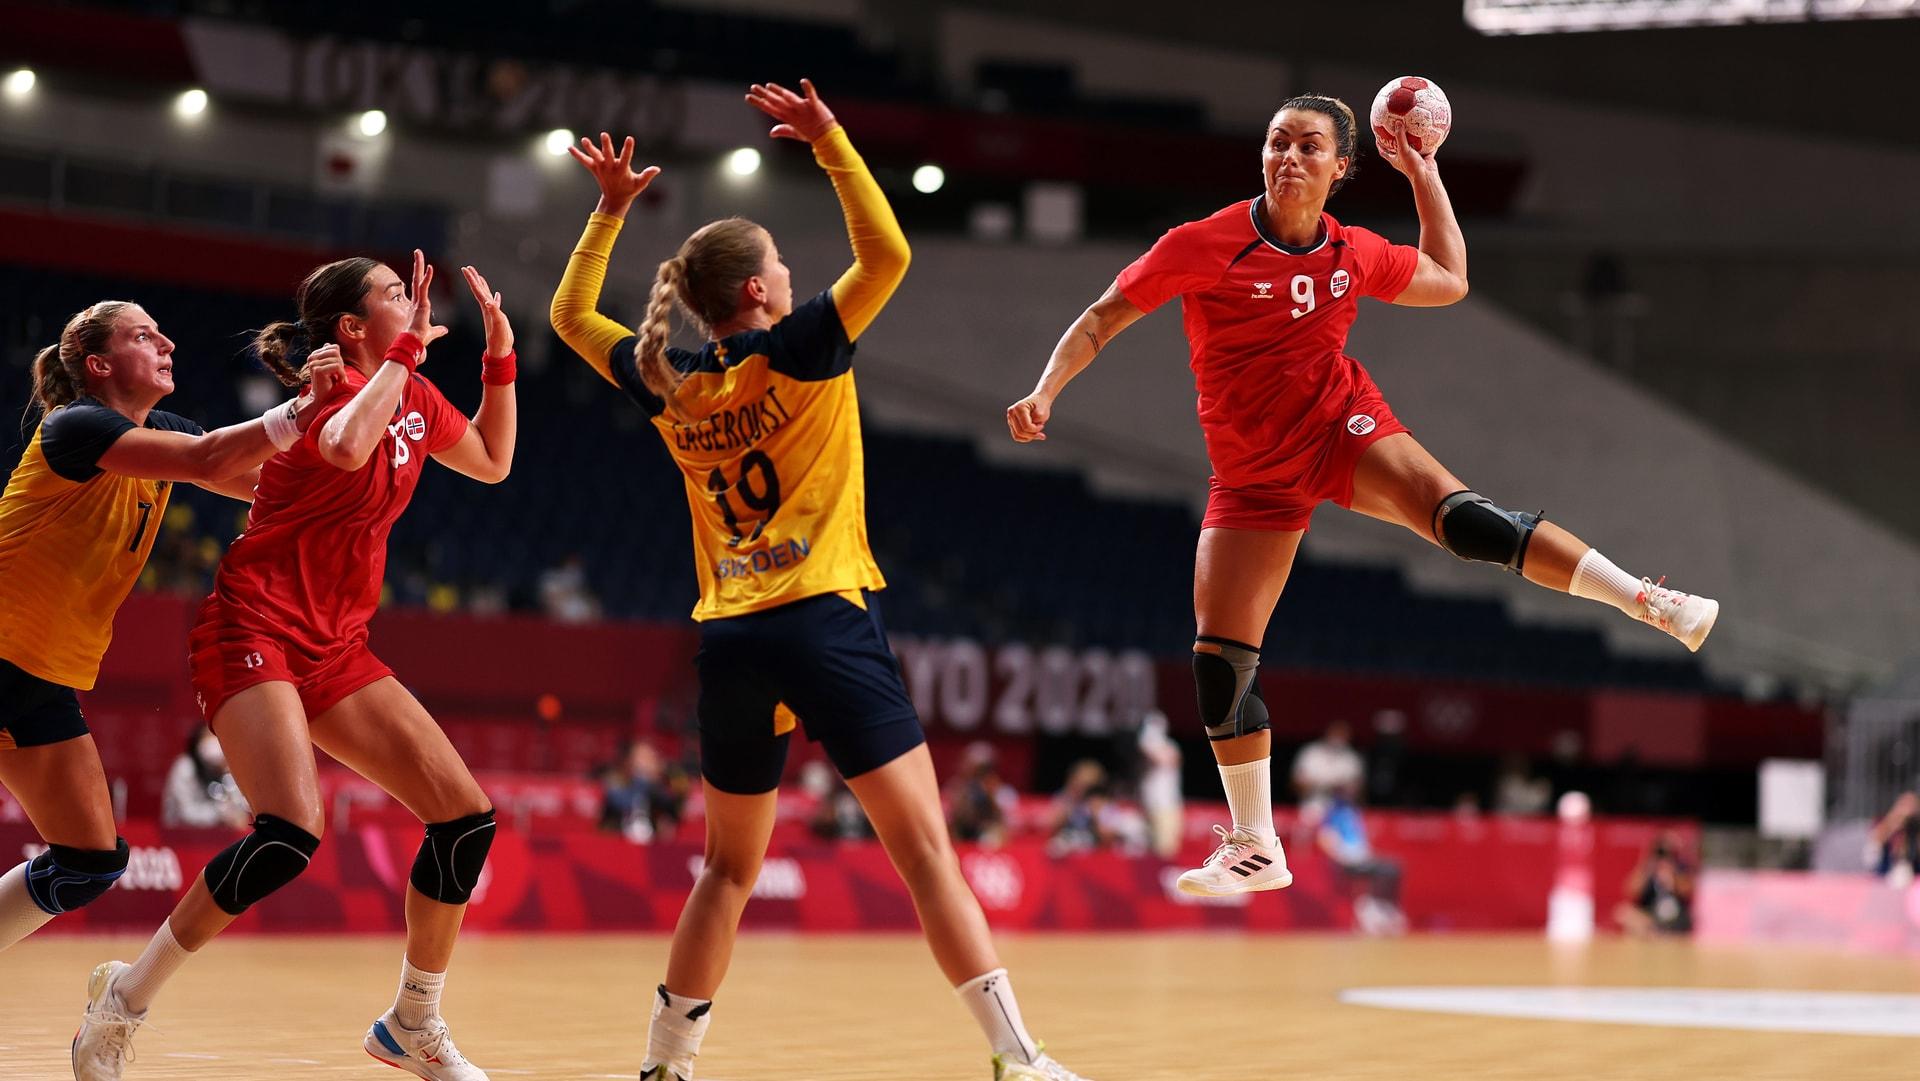 Image for Norway steamrolls Sweden to claim bronze in women's handball